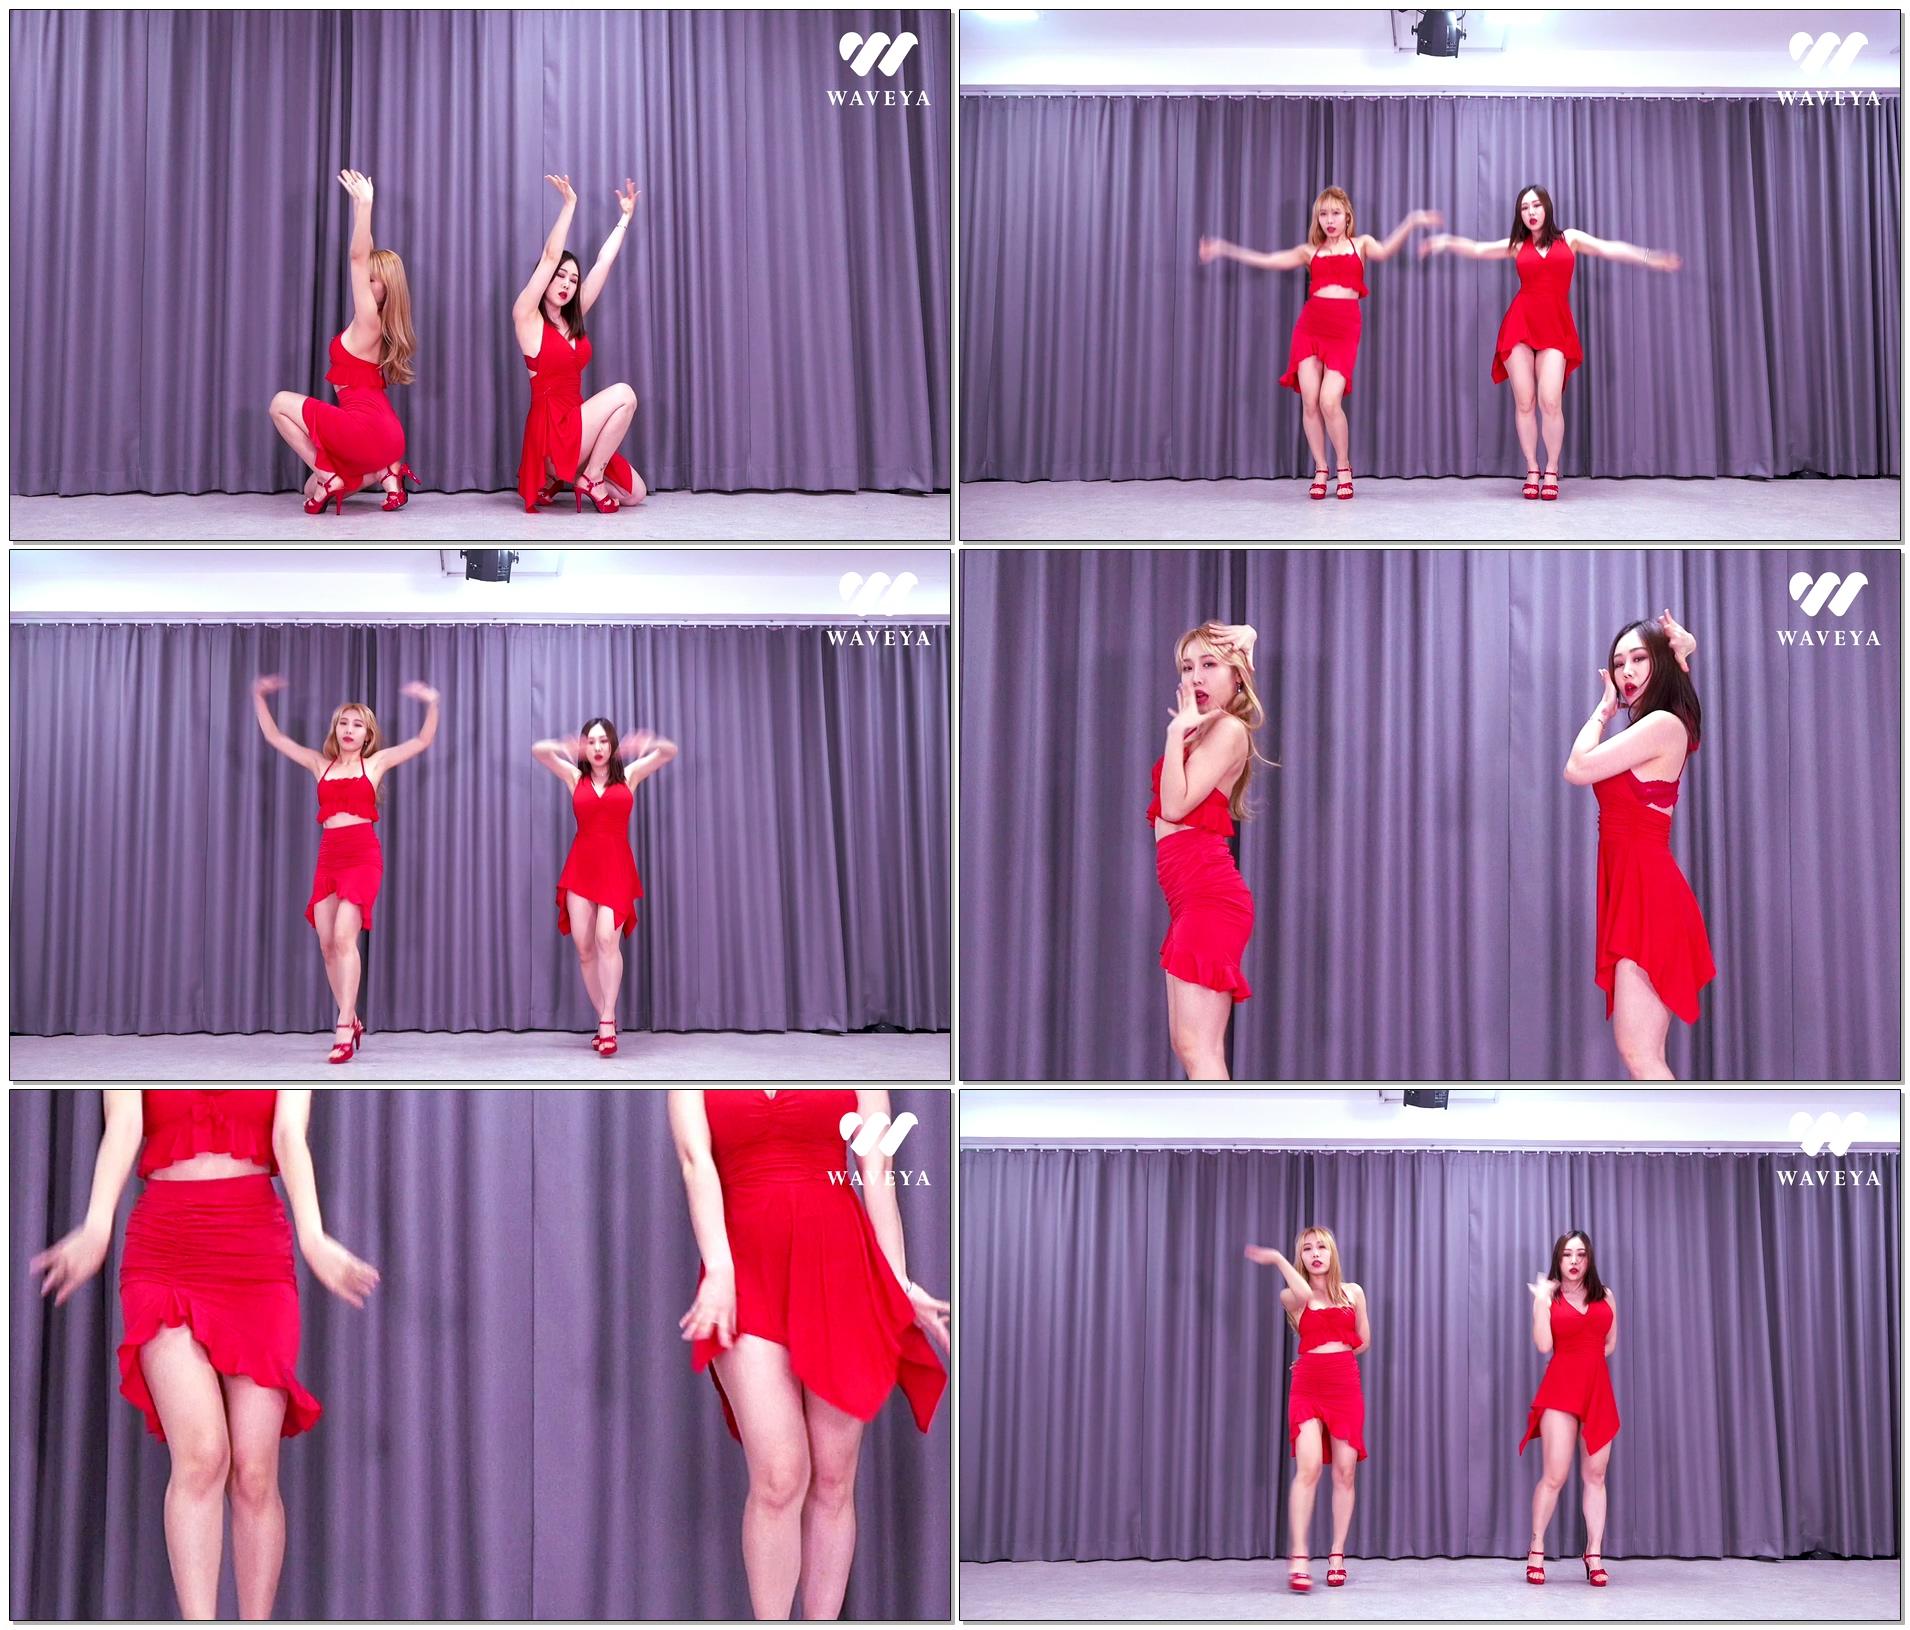 [4K视频](G)I-DLE - (火花)(HWAA) 翻跳Cover Dance Waveya W202101300111 Waveya2021 第2张